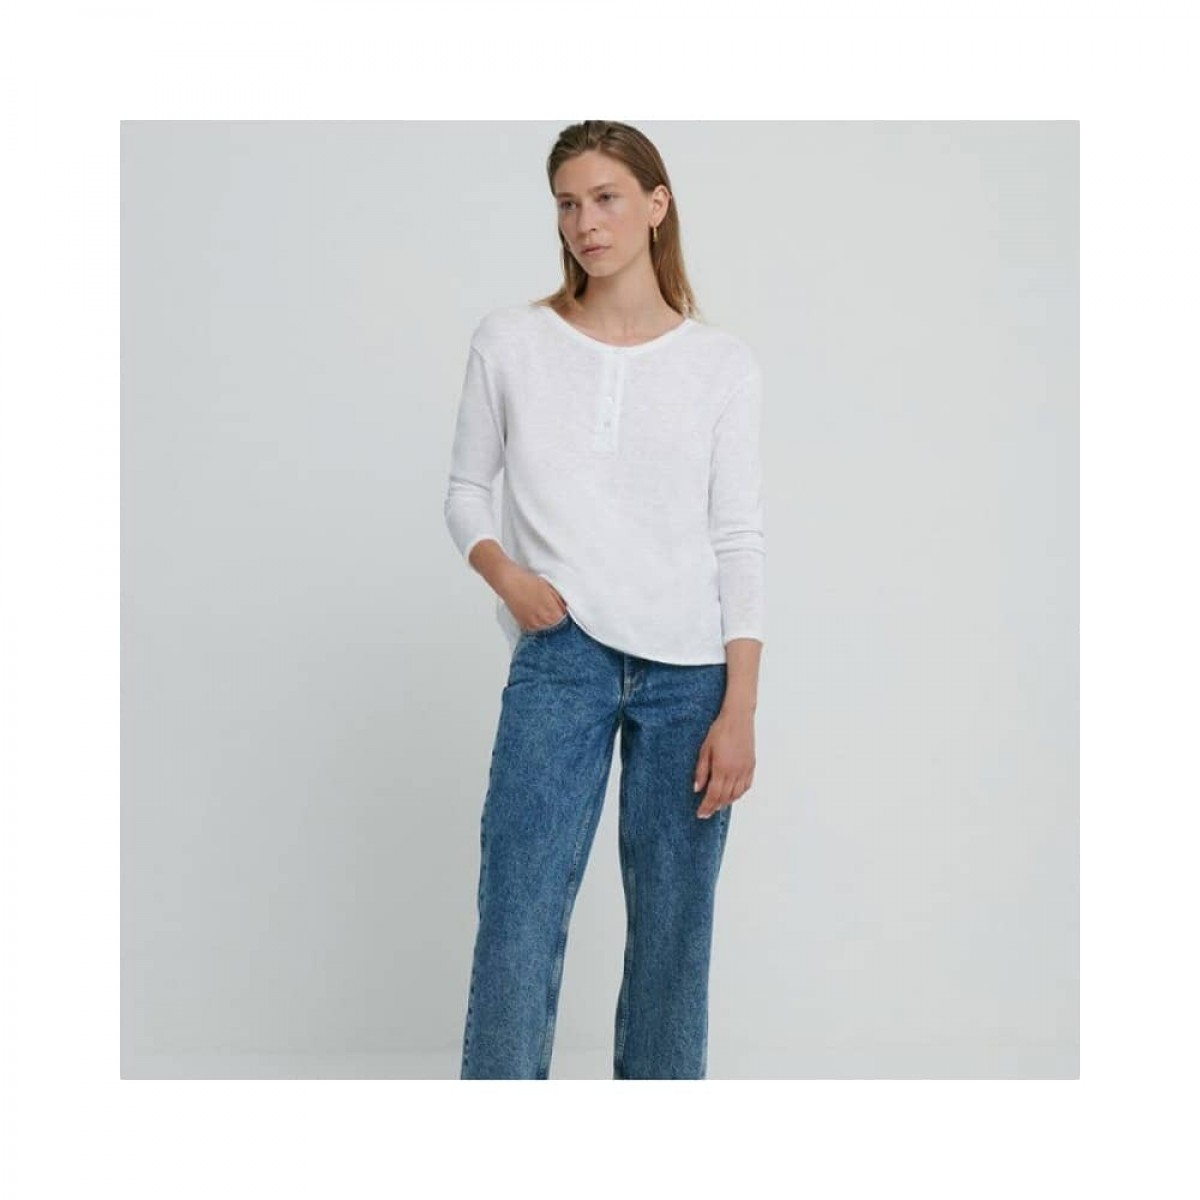 sonoma bluse - white - model front